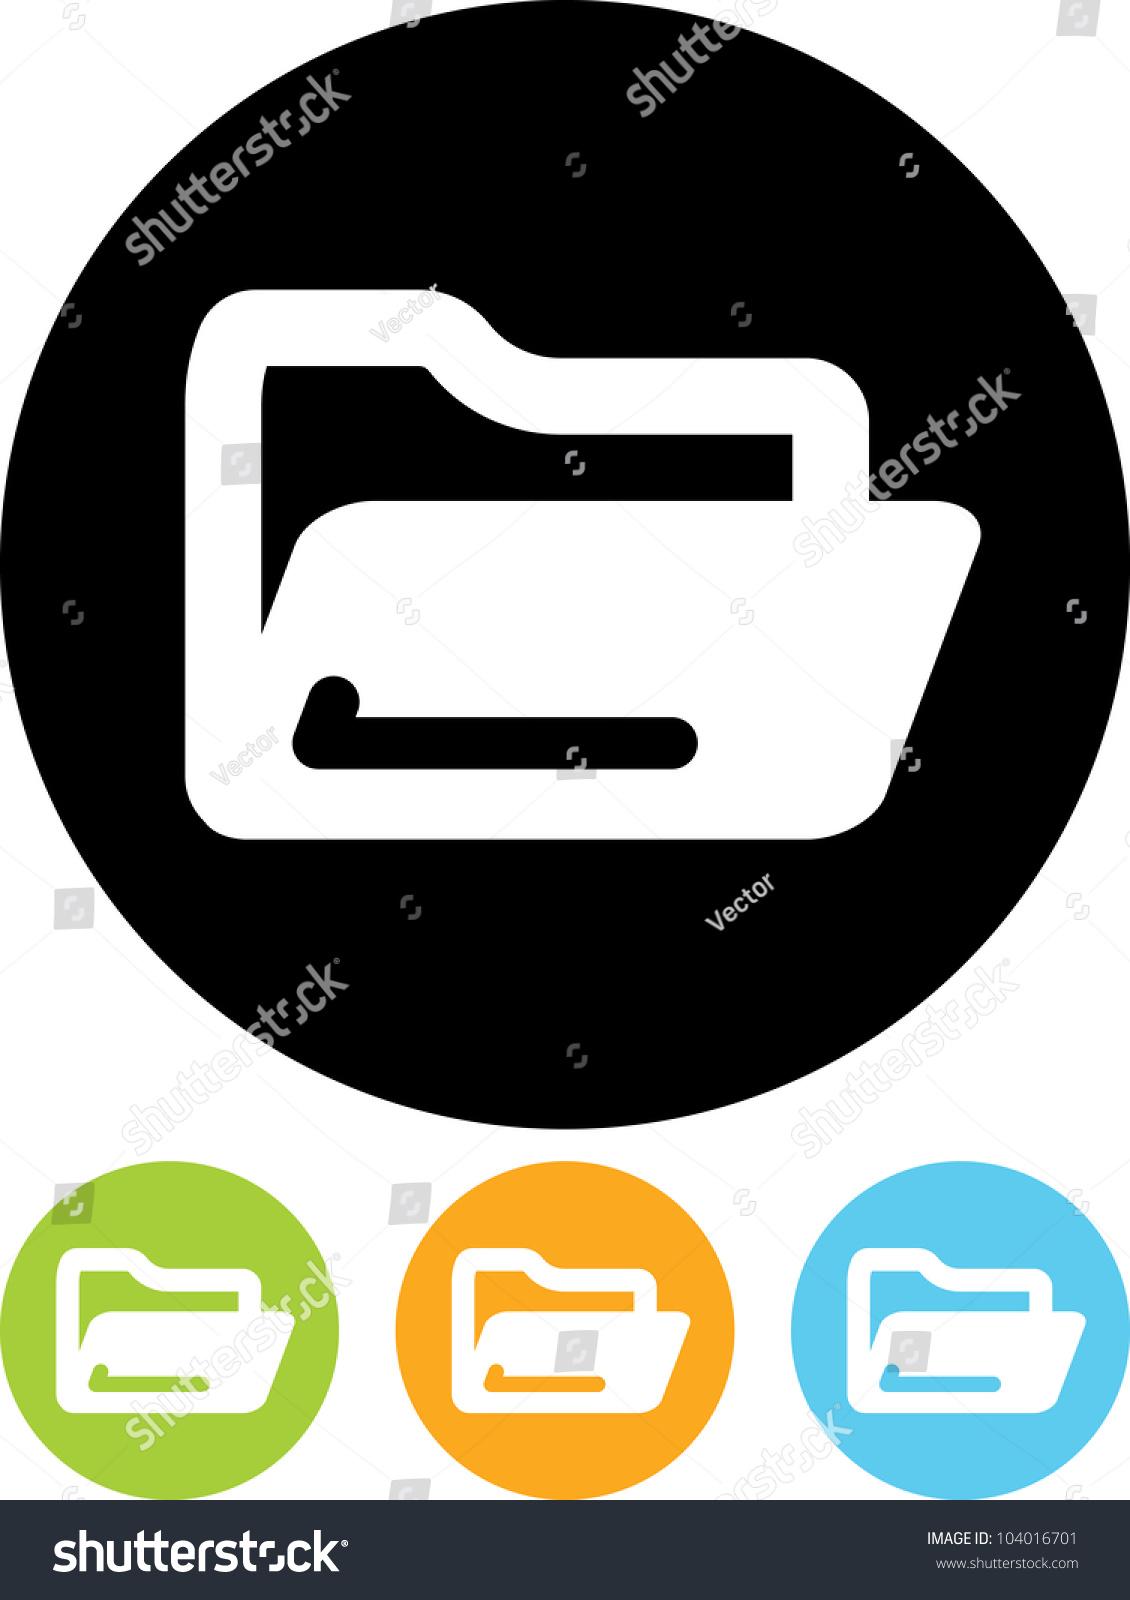 logo logo 标志 设计 矢量 矢量图 素材 图标 1129_1600 竖版 竖屏